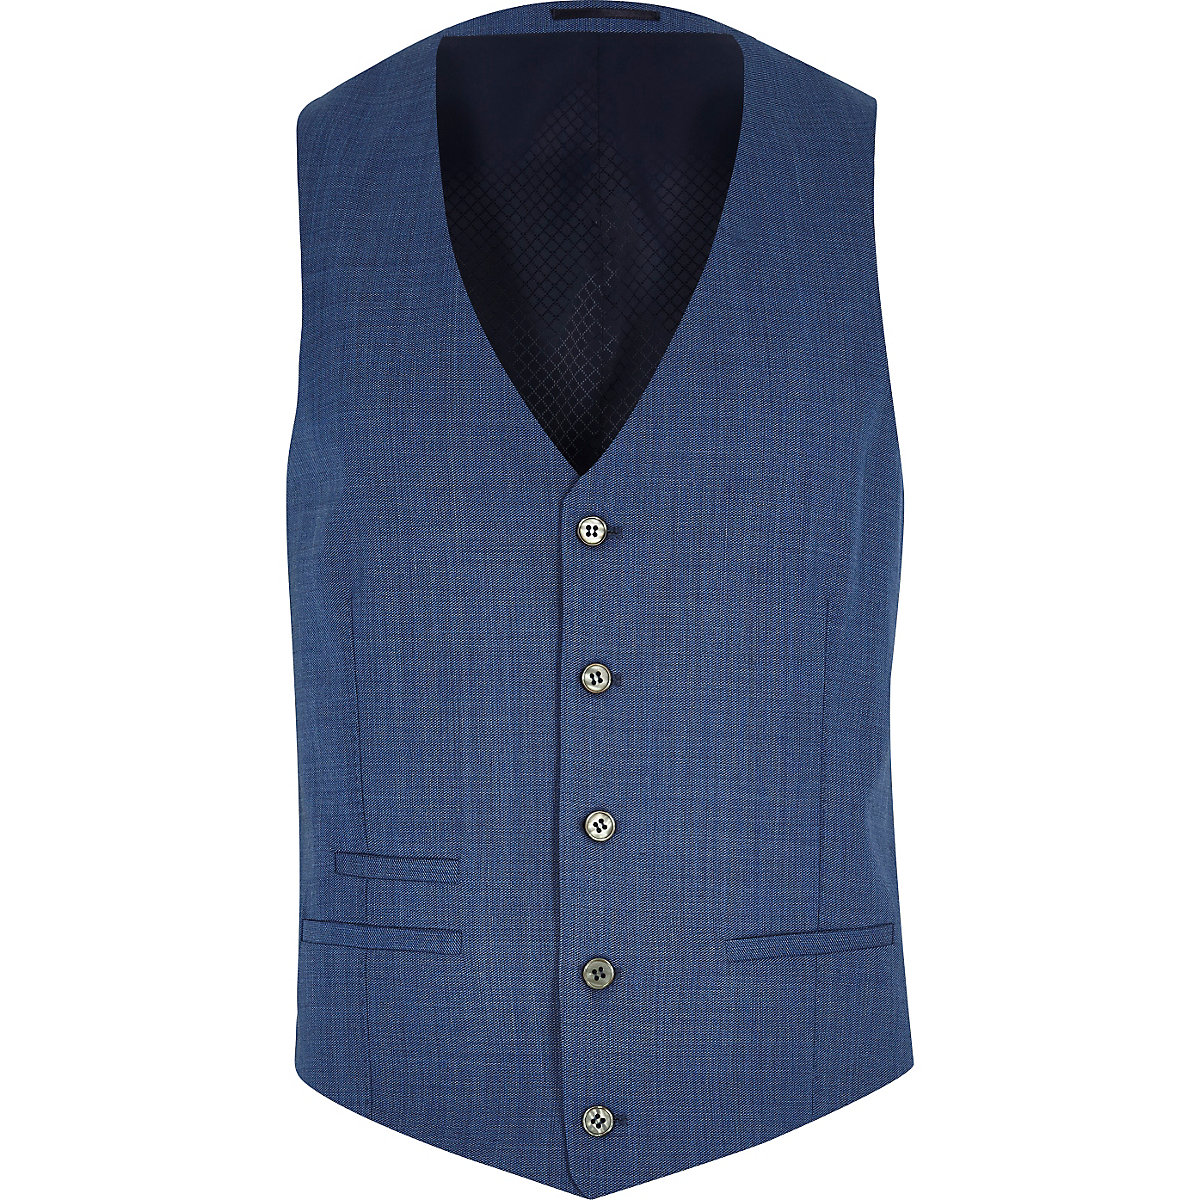 Blue textured wool-blend vest